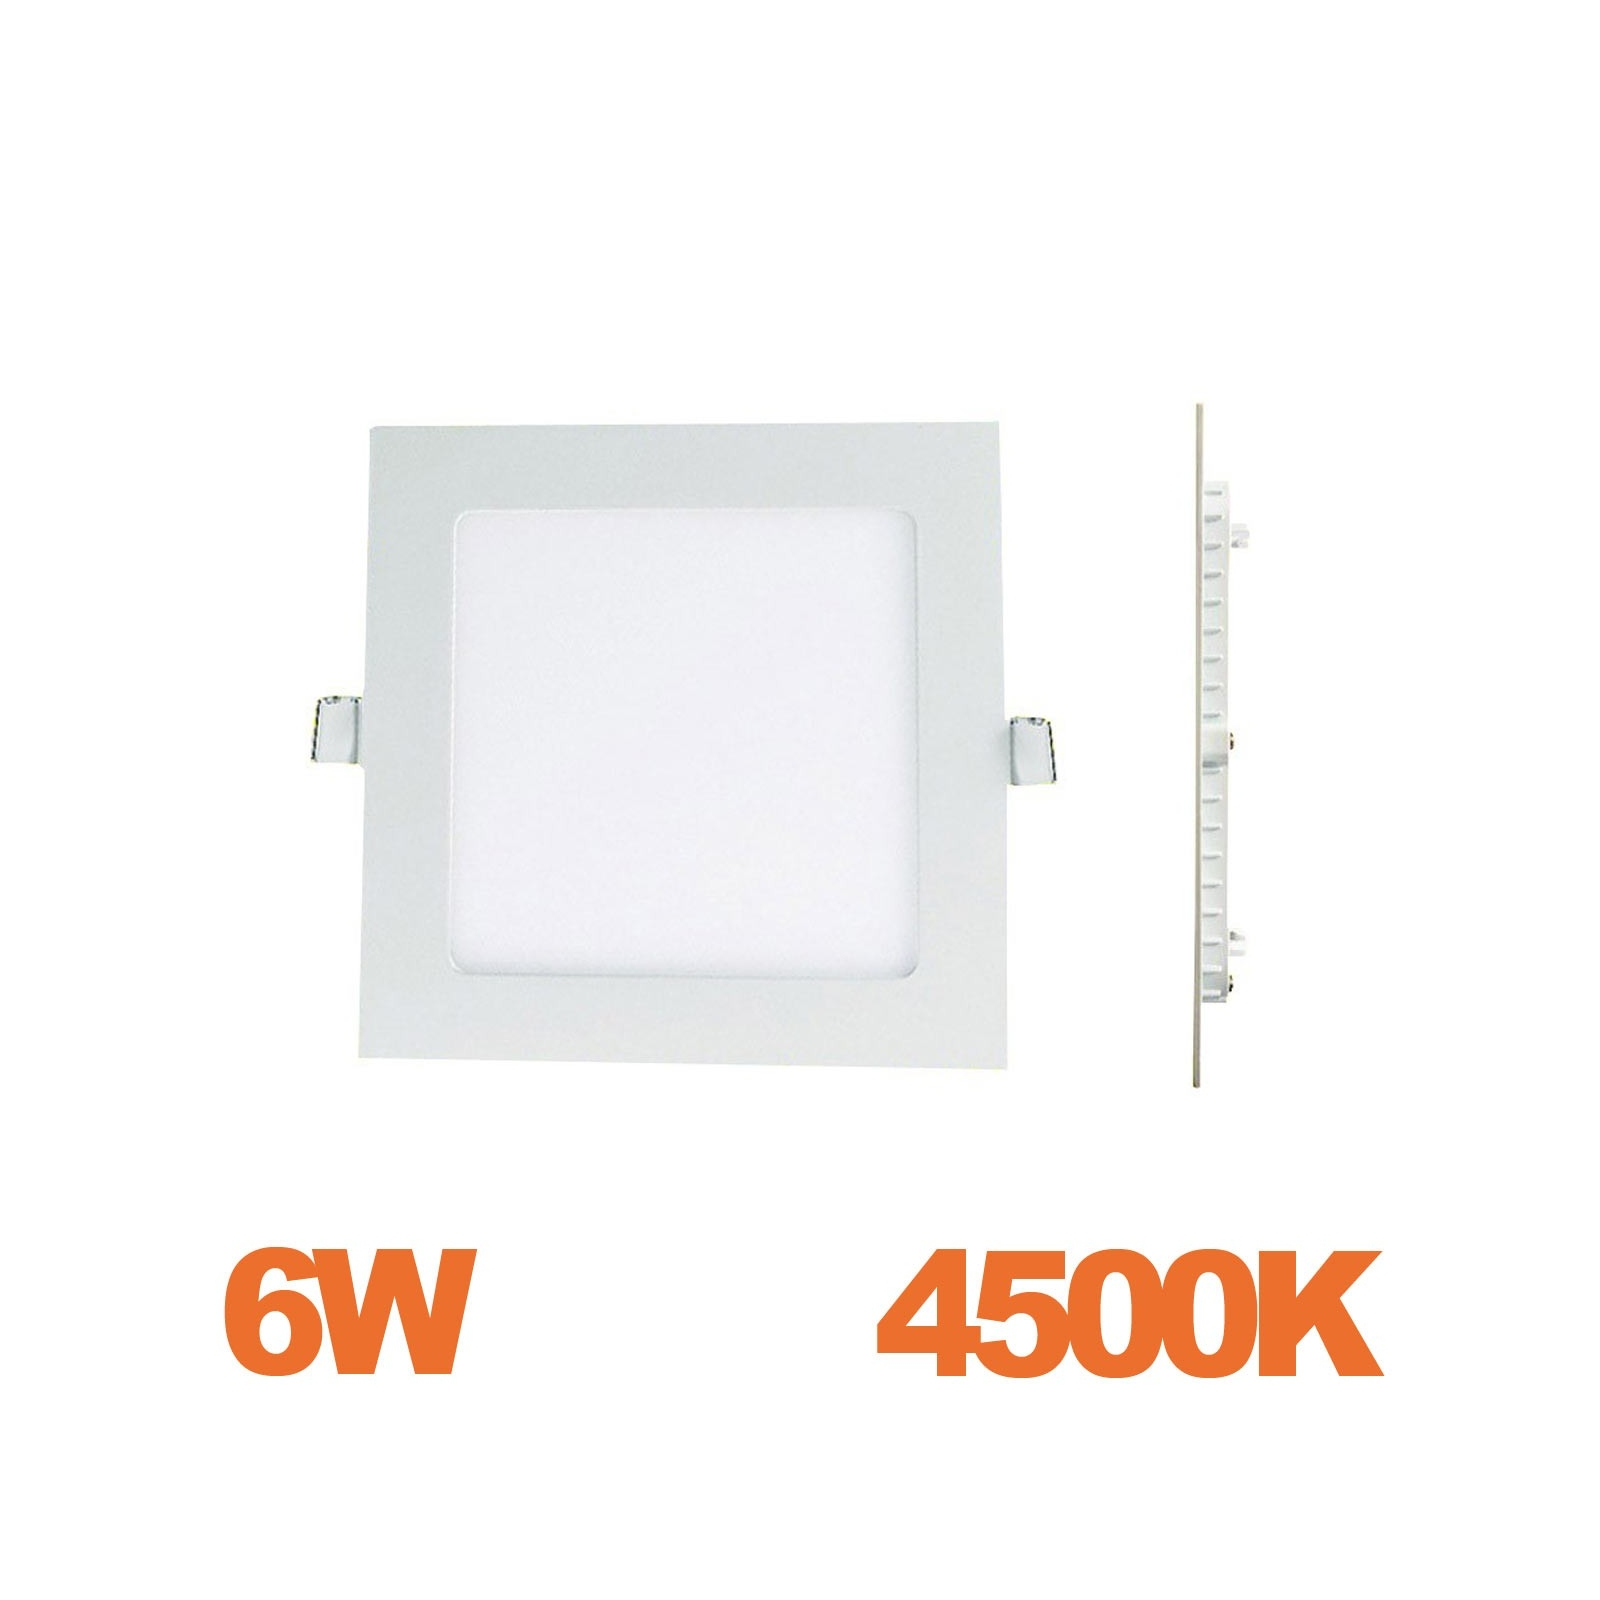 Spot Encastrable LED Carre Downlight Panel Extra-Plat 6W Blanc Neutre 4500K